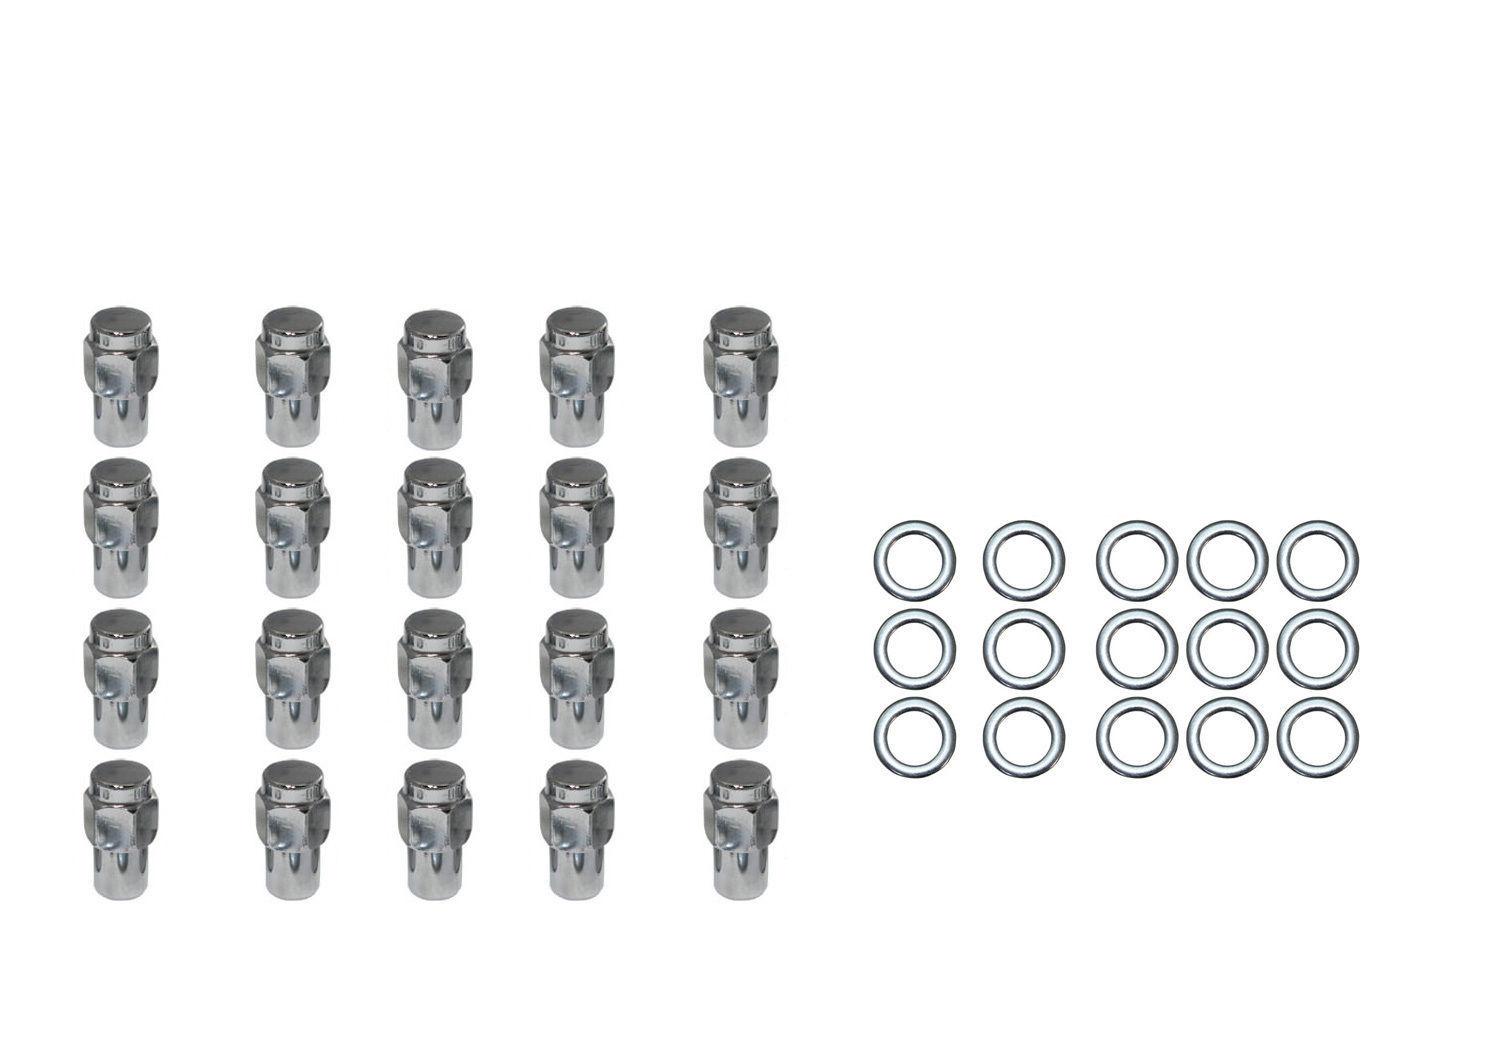 20 Pc Set Chrome Steel Mag Shank Lug Nuts 1 2 X 20 Right